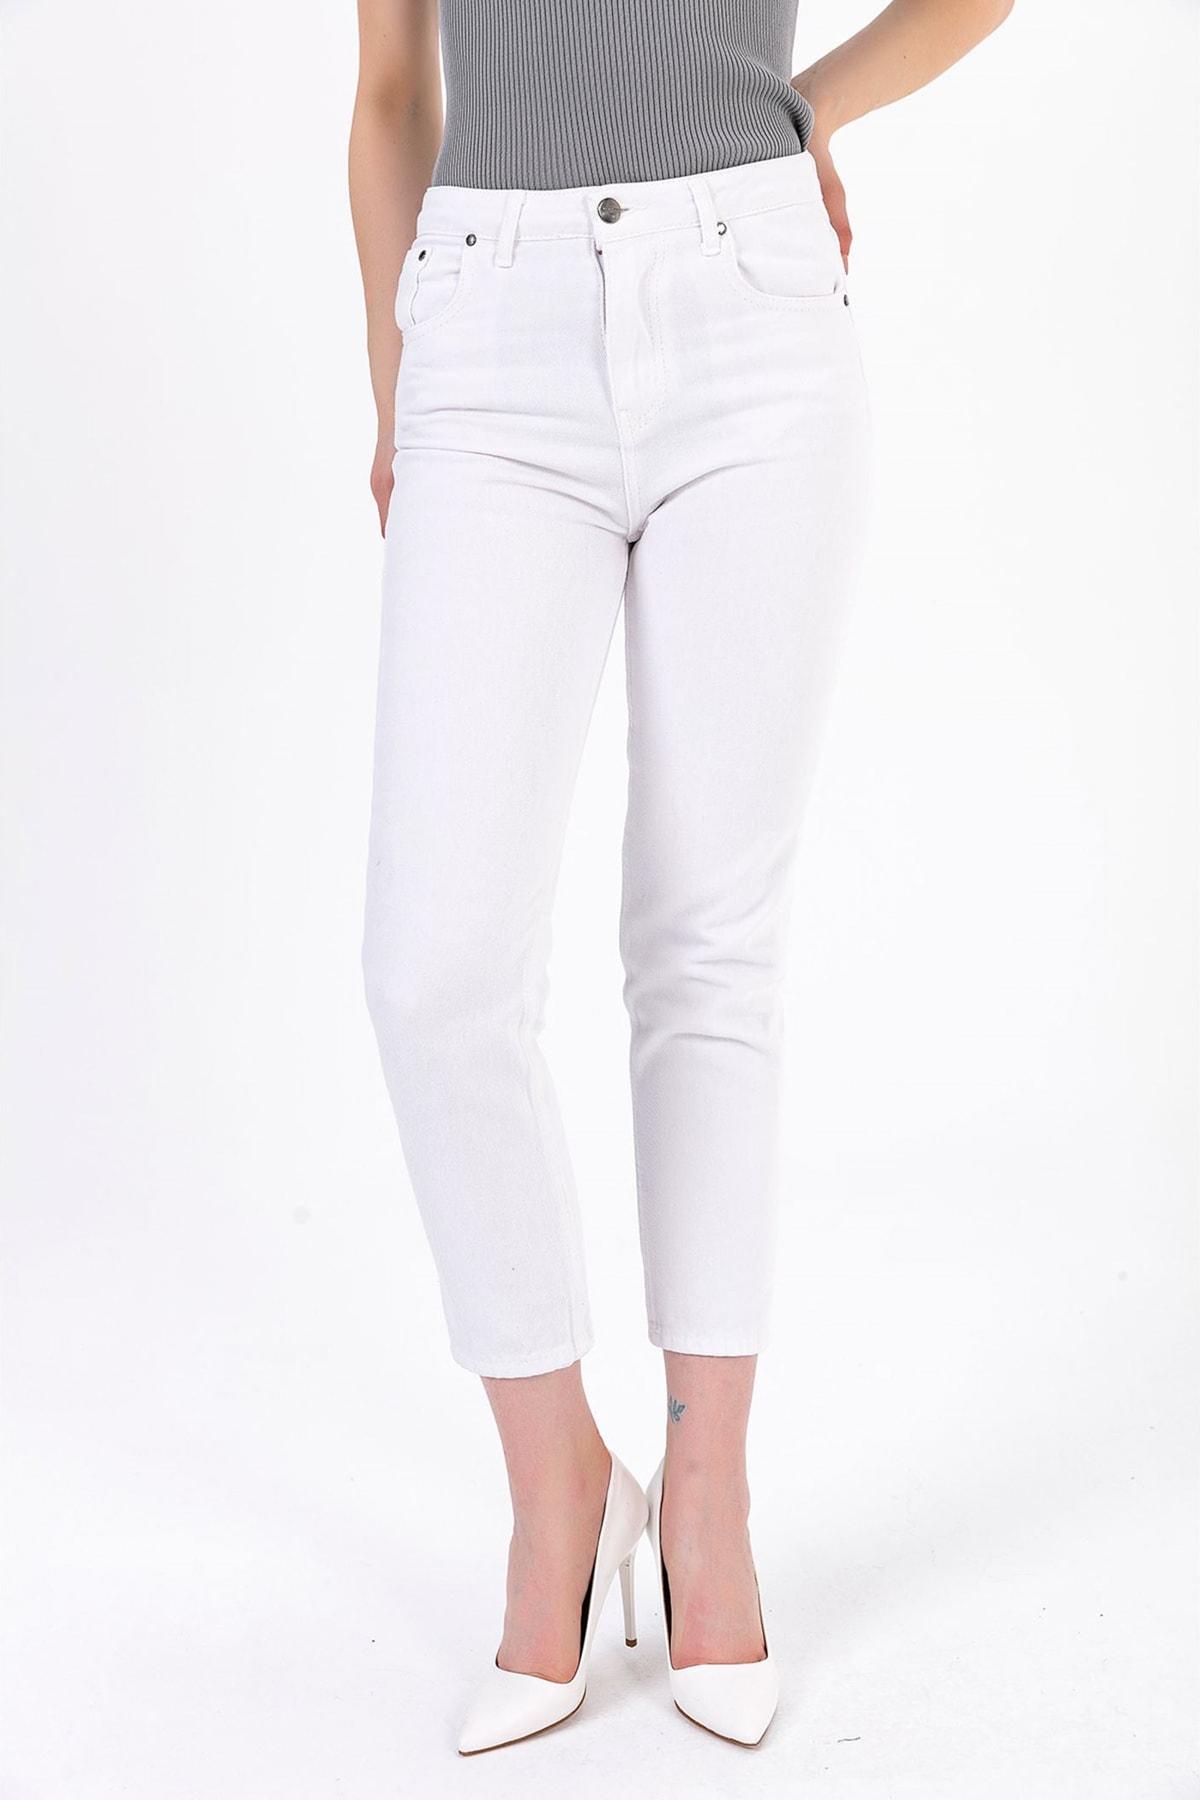 TIFFANY&TOMATO Kadın Beyaz Mom Jeans Pantolon A0055Y833T 2